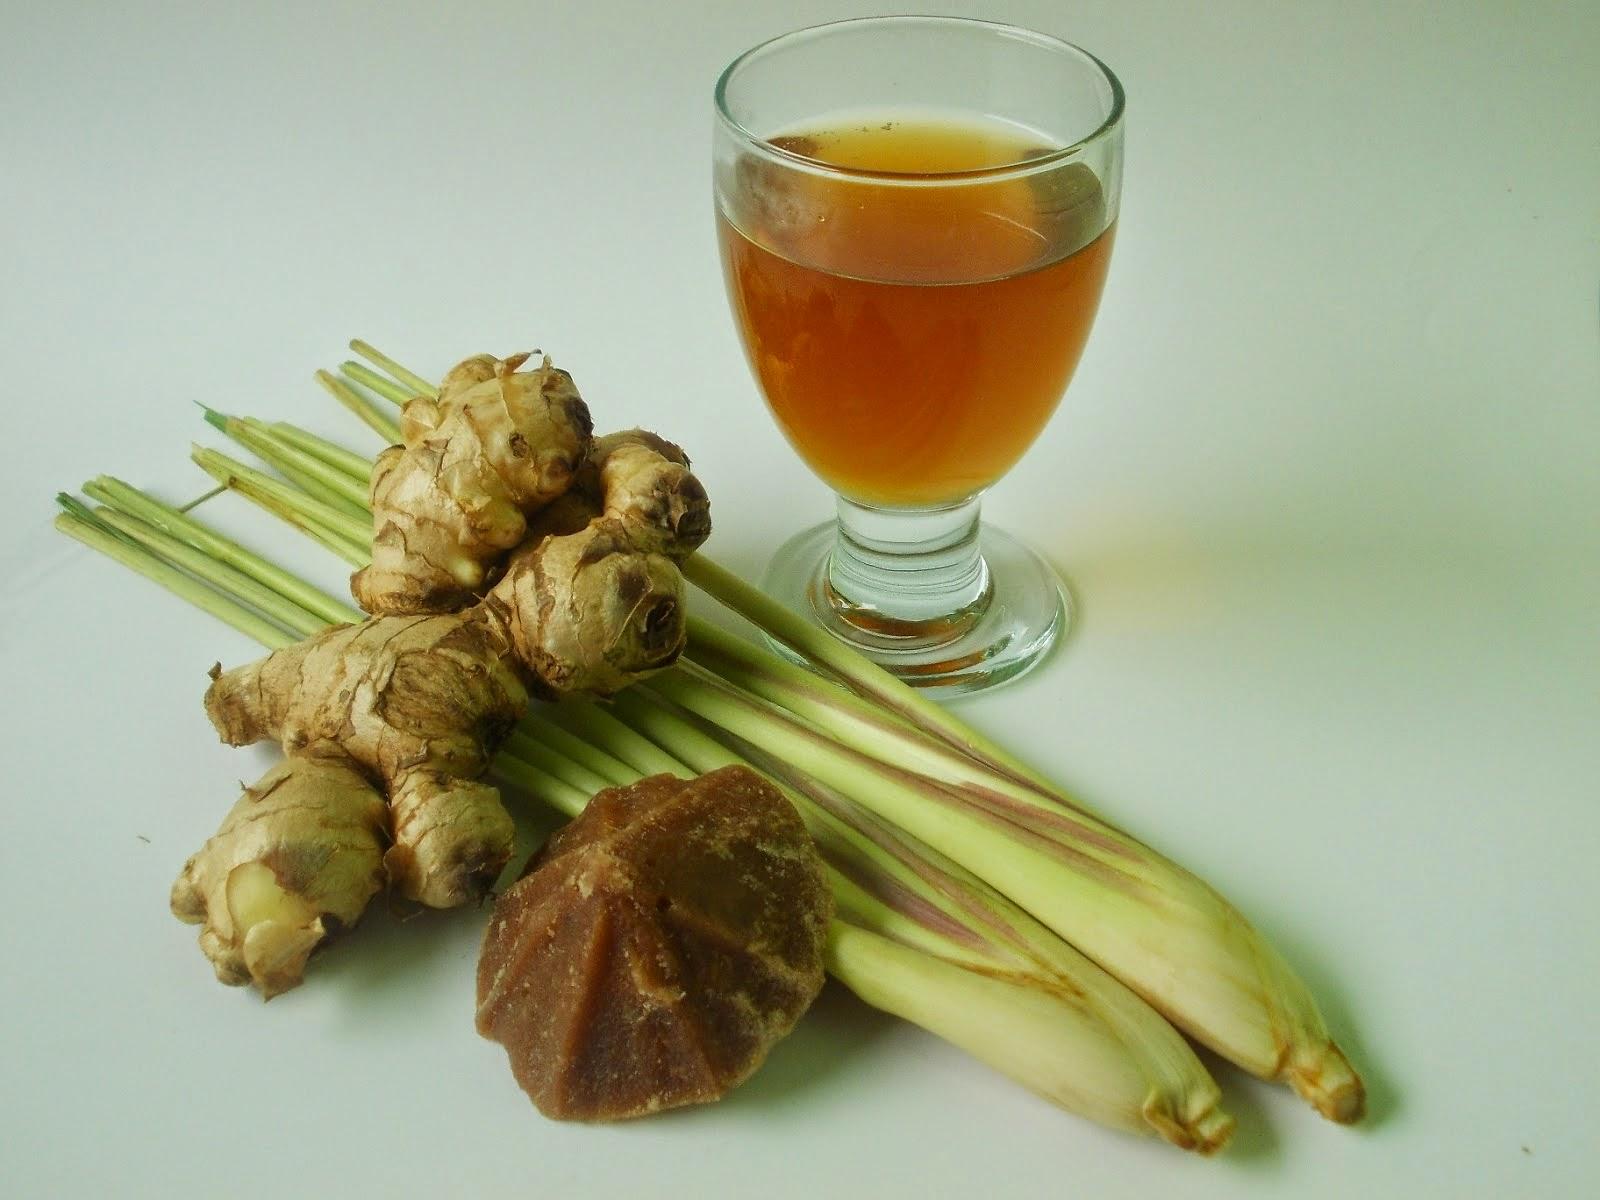 Resep Wedang Jahe Serai Ginger Lemongrass Drink Recipes RESEP